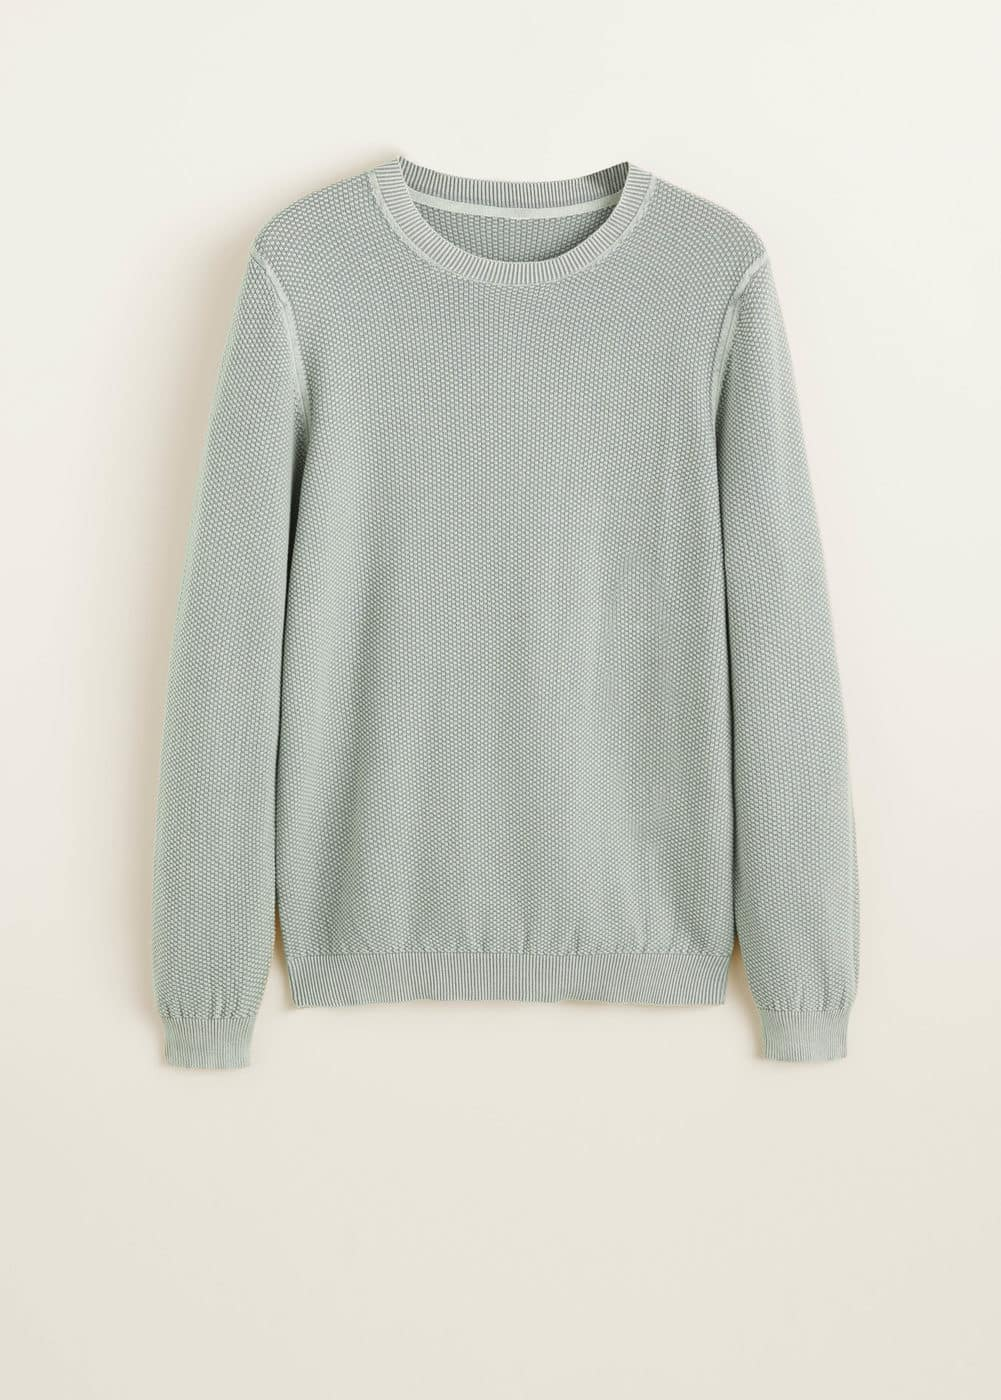 Mango - Structured cotton sweater - 5